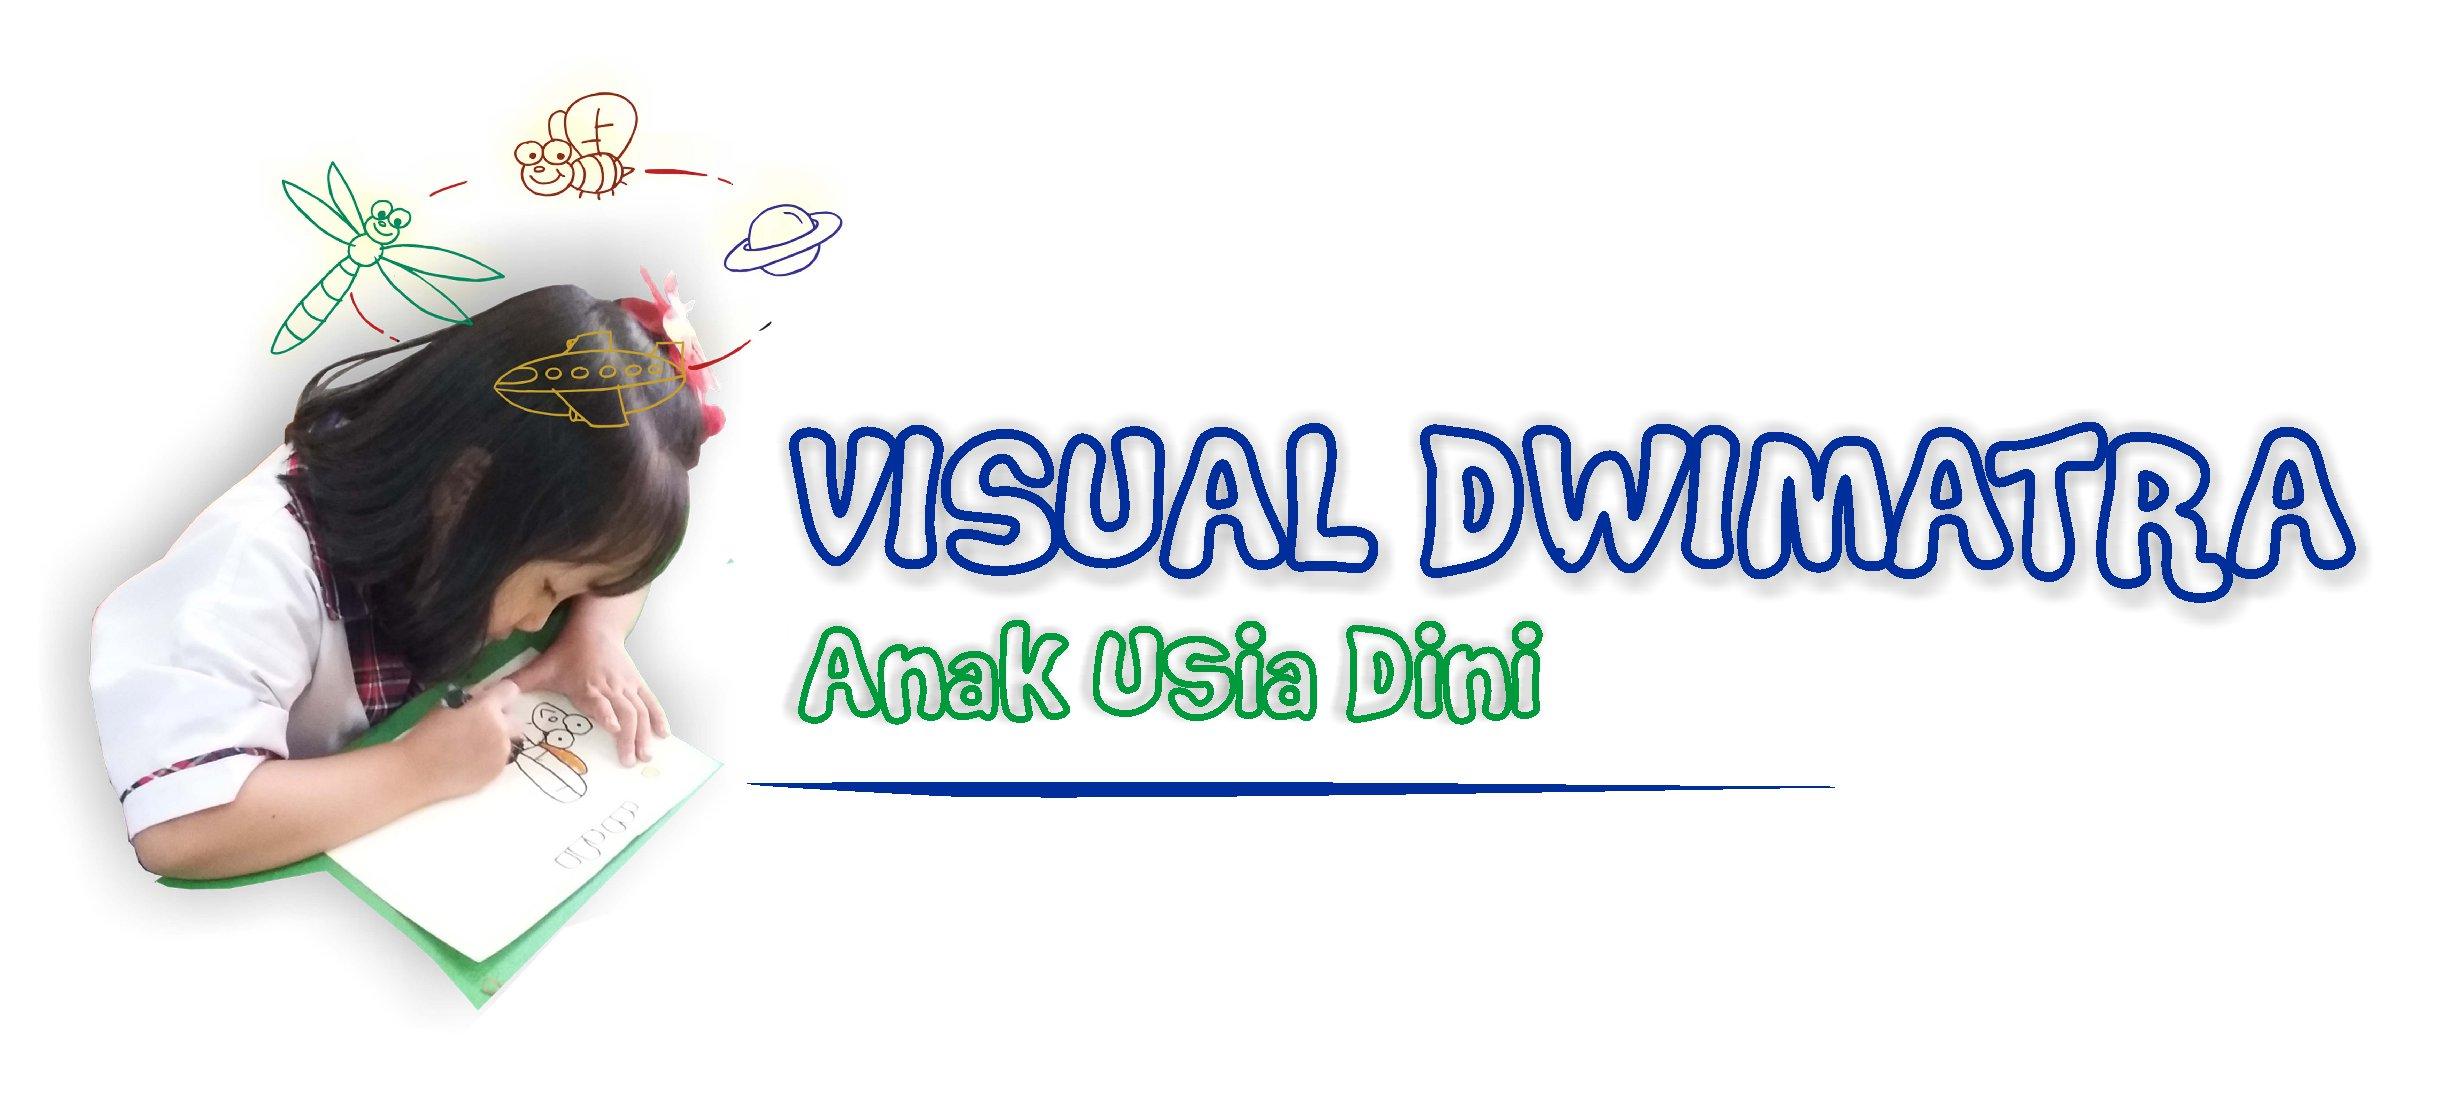 VISUAL DWIMATRA AUD